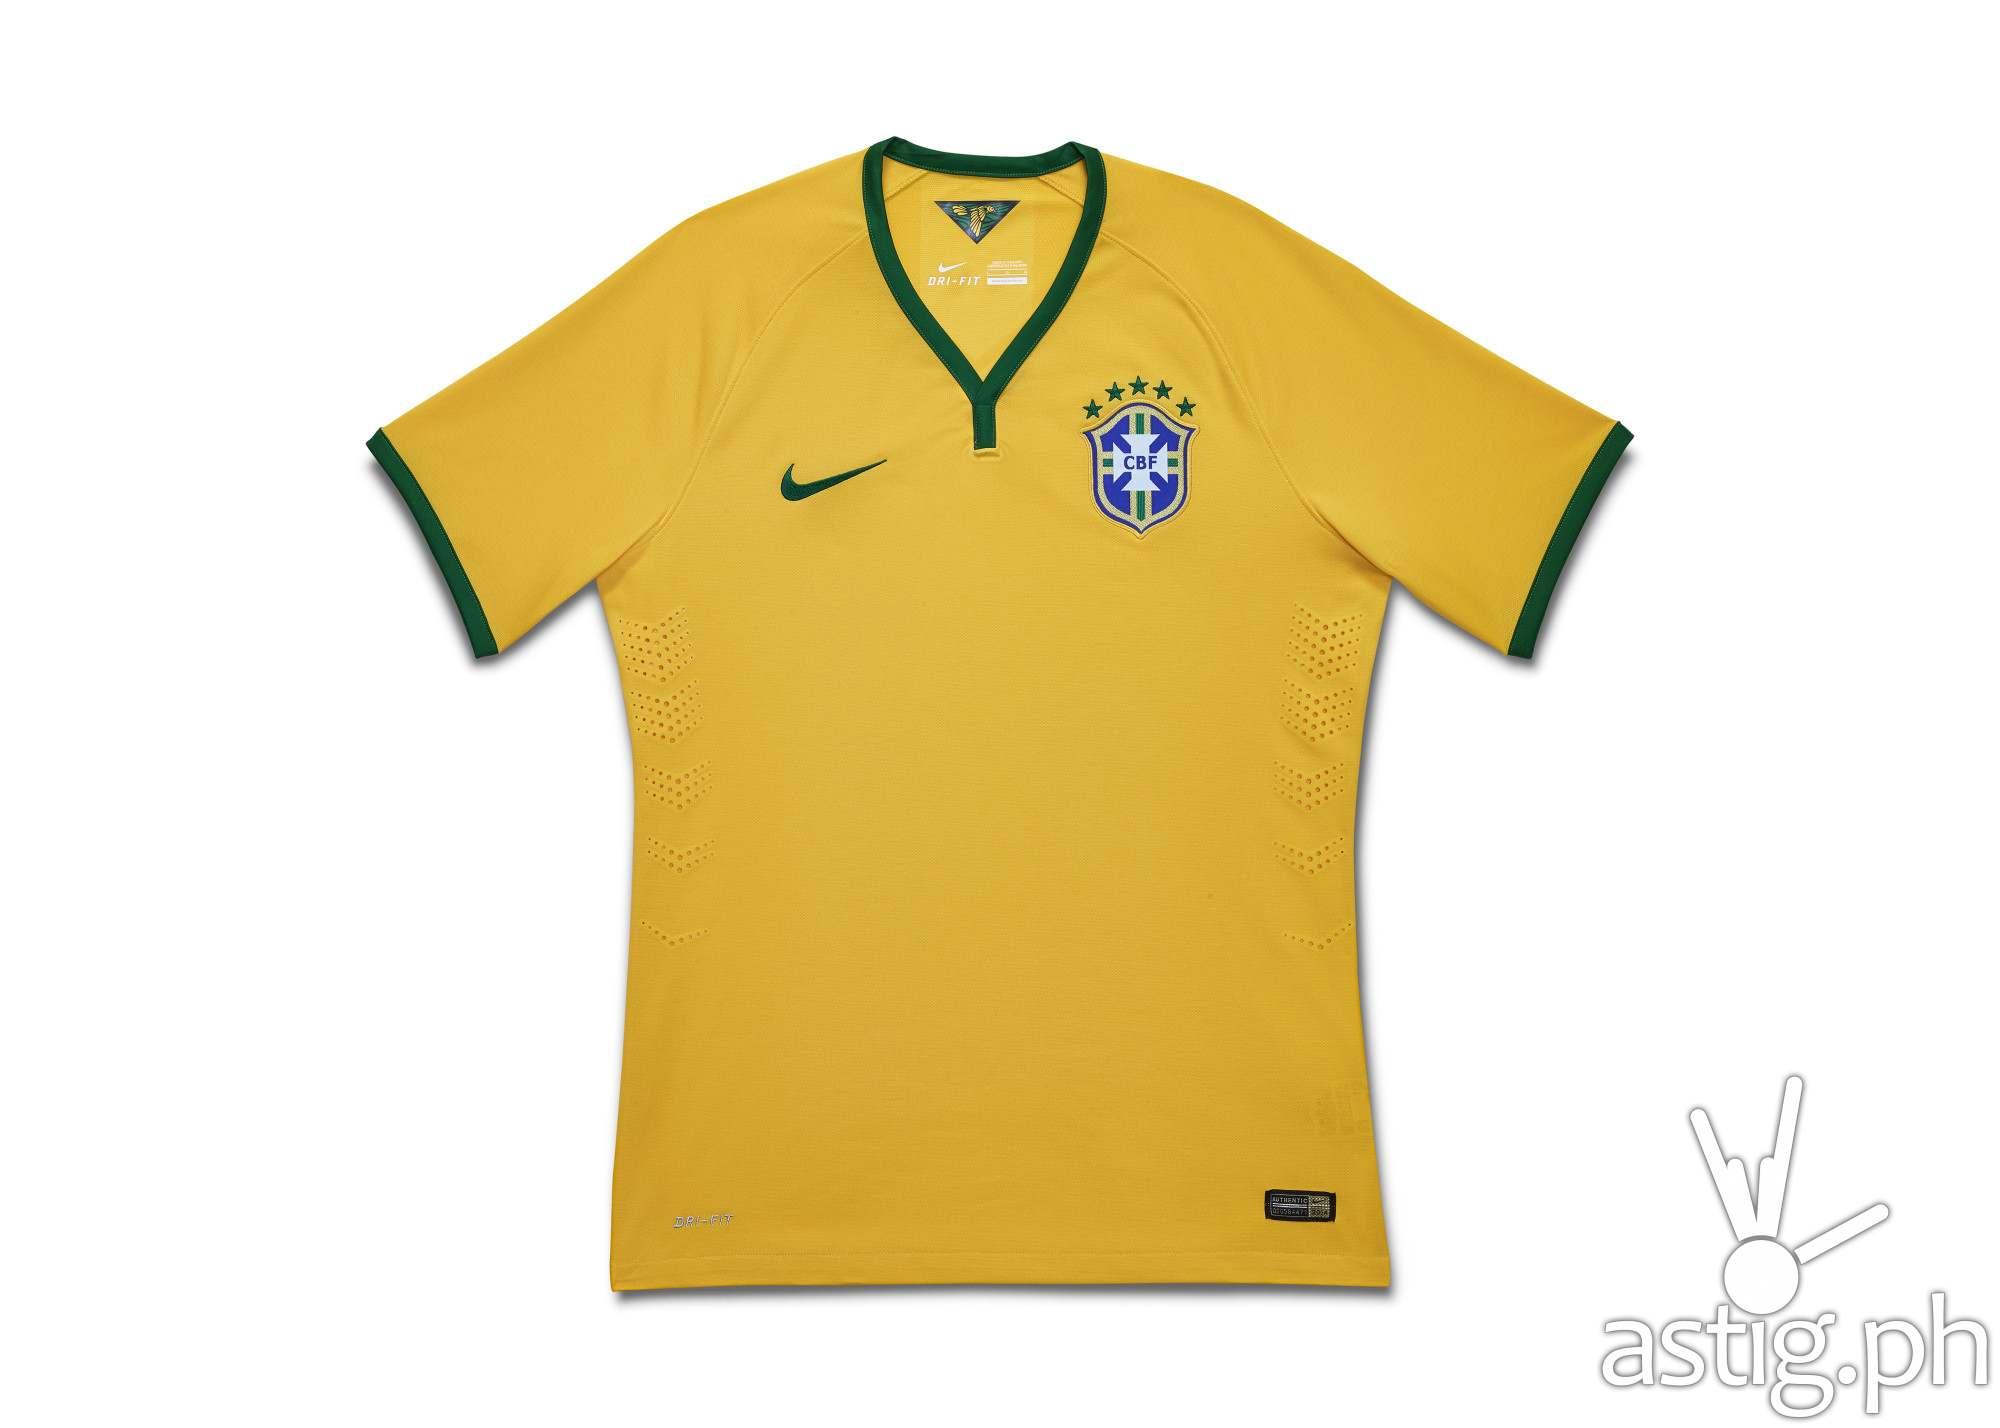 Brasil FIFA 2014 jersey uniform by Nike